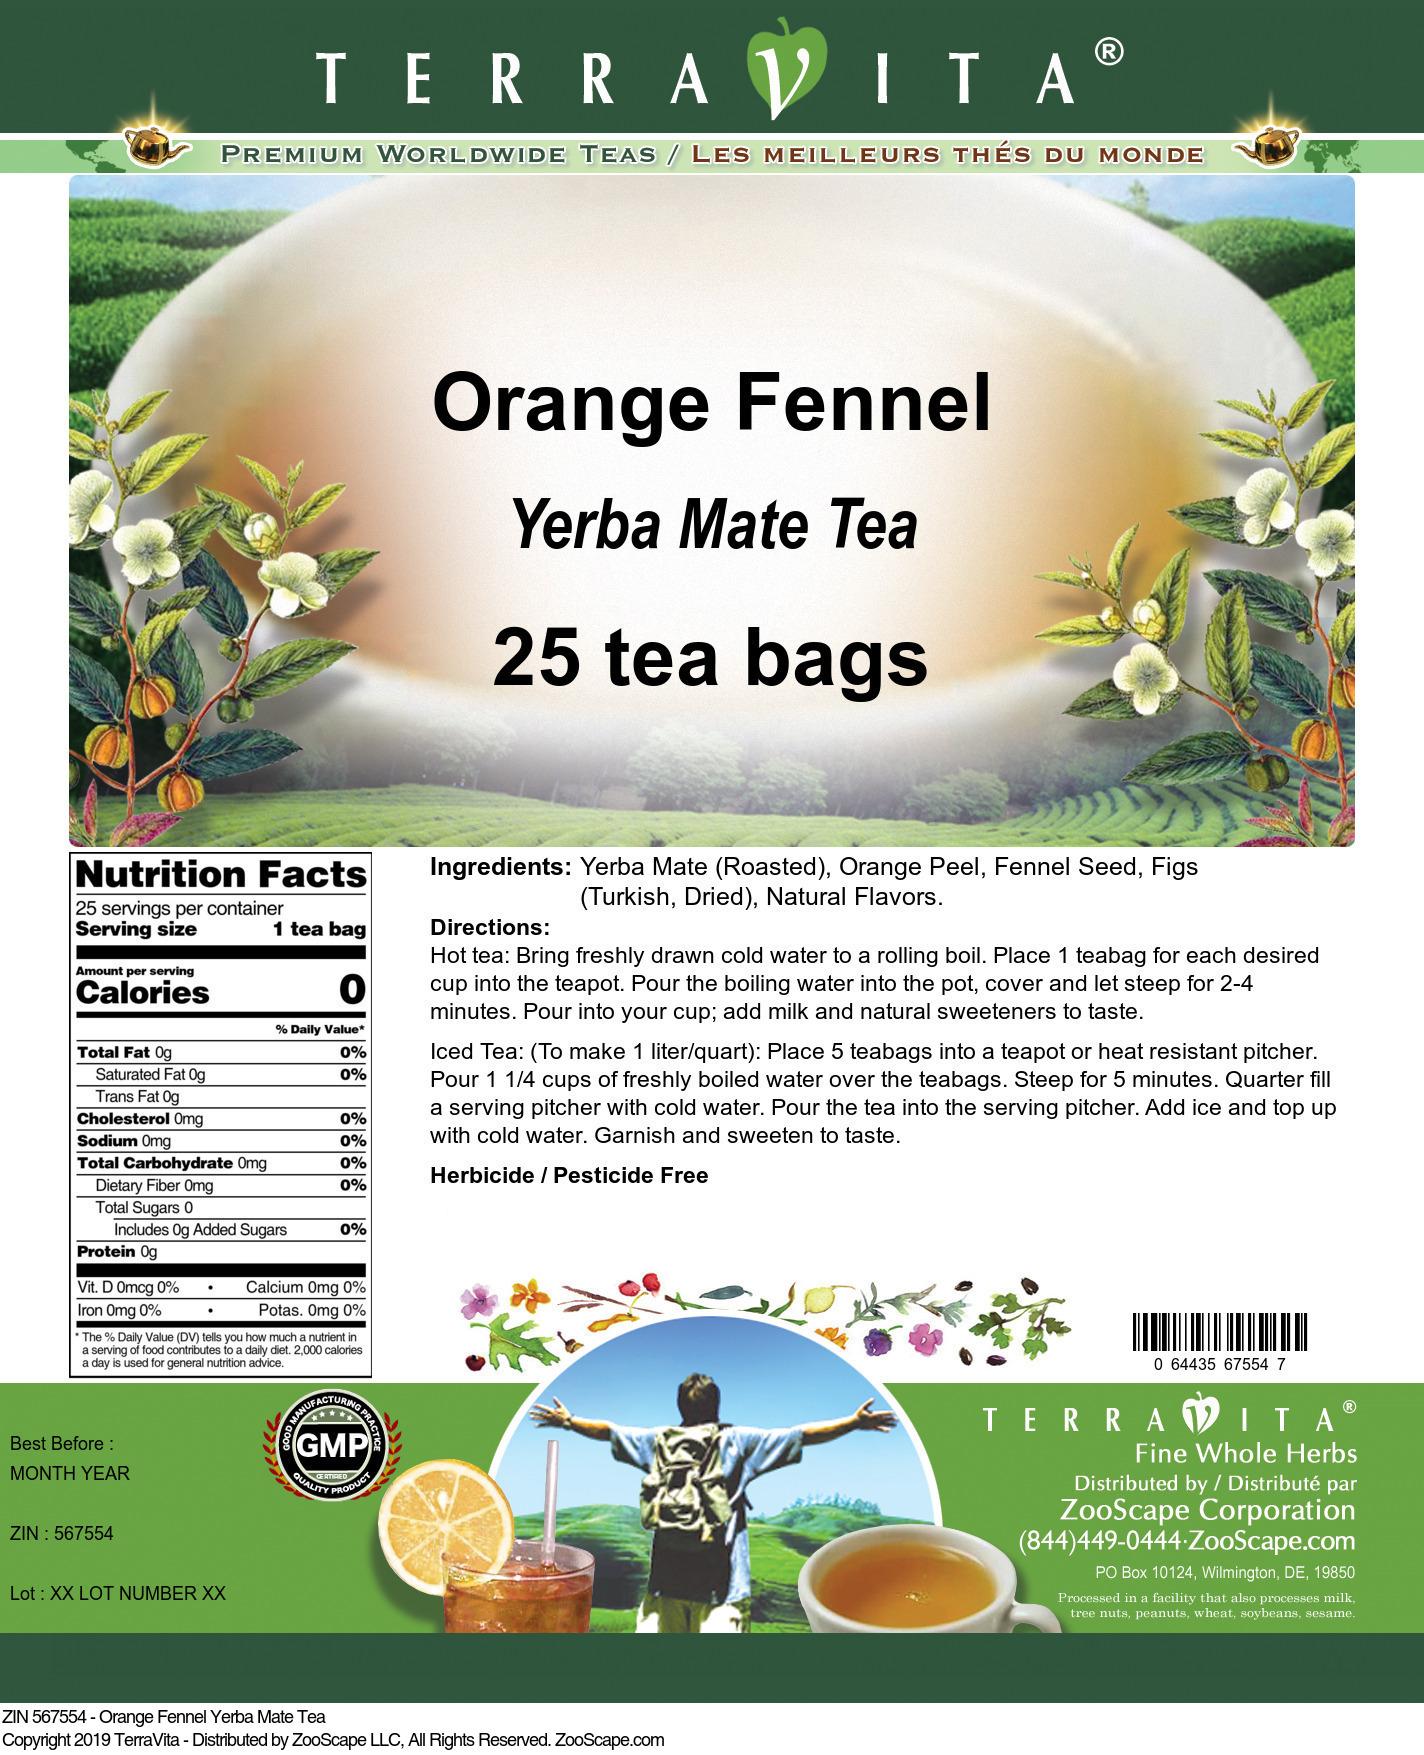 Orange Fennel Yerba Mate